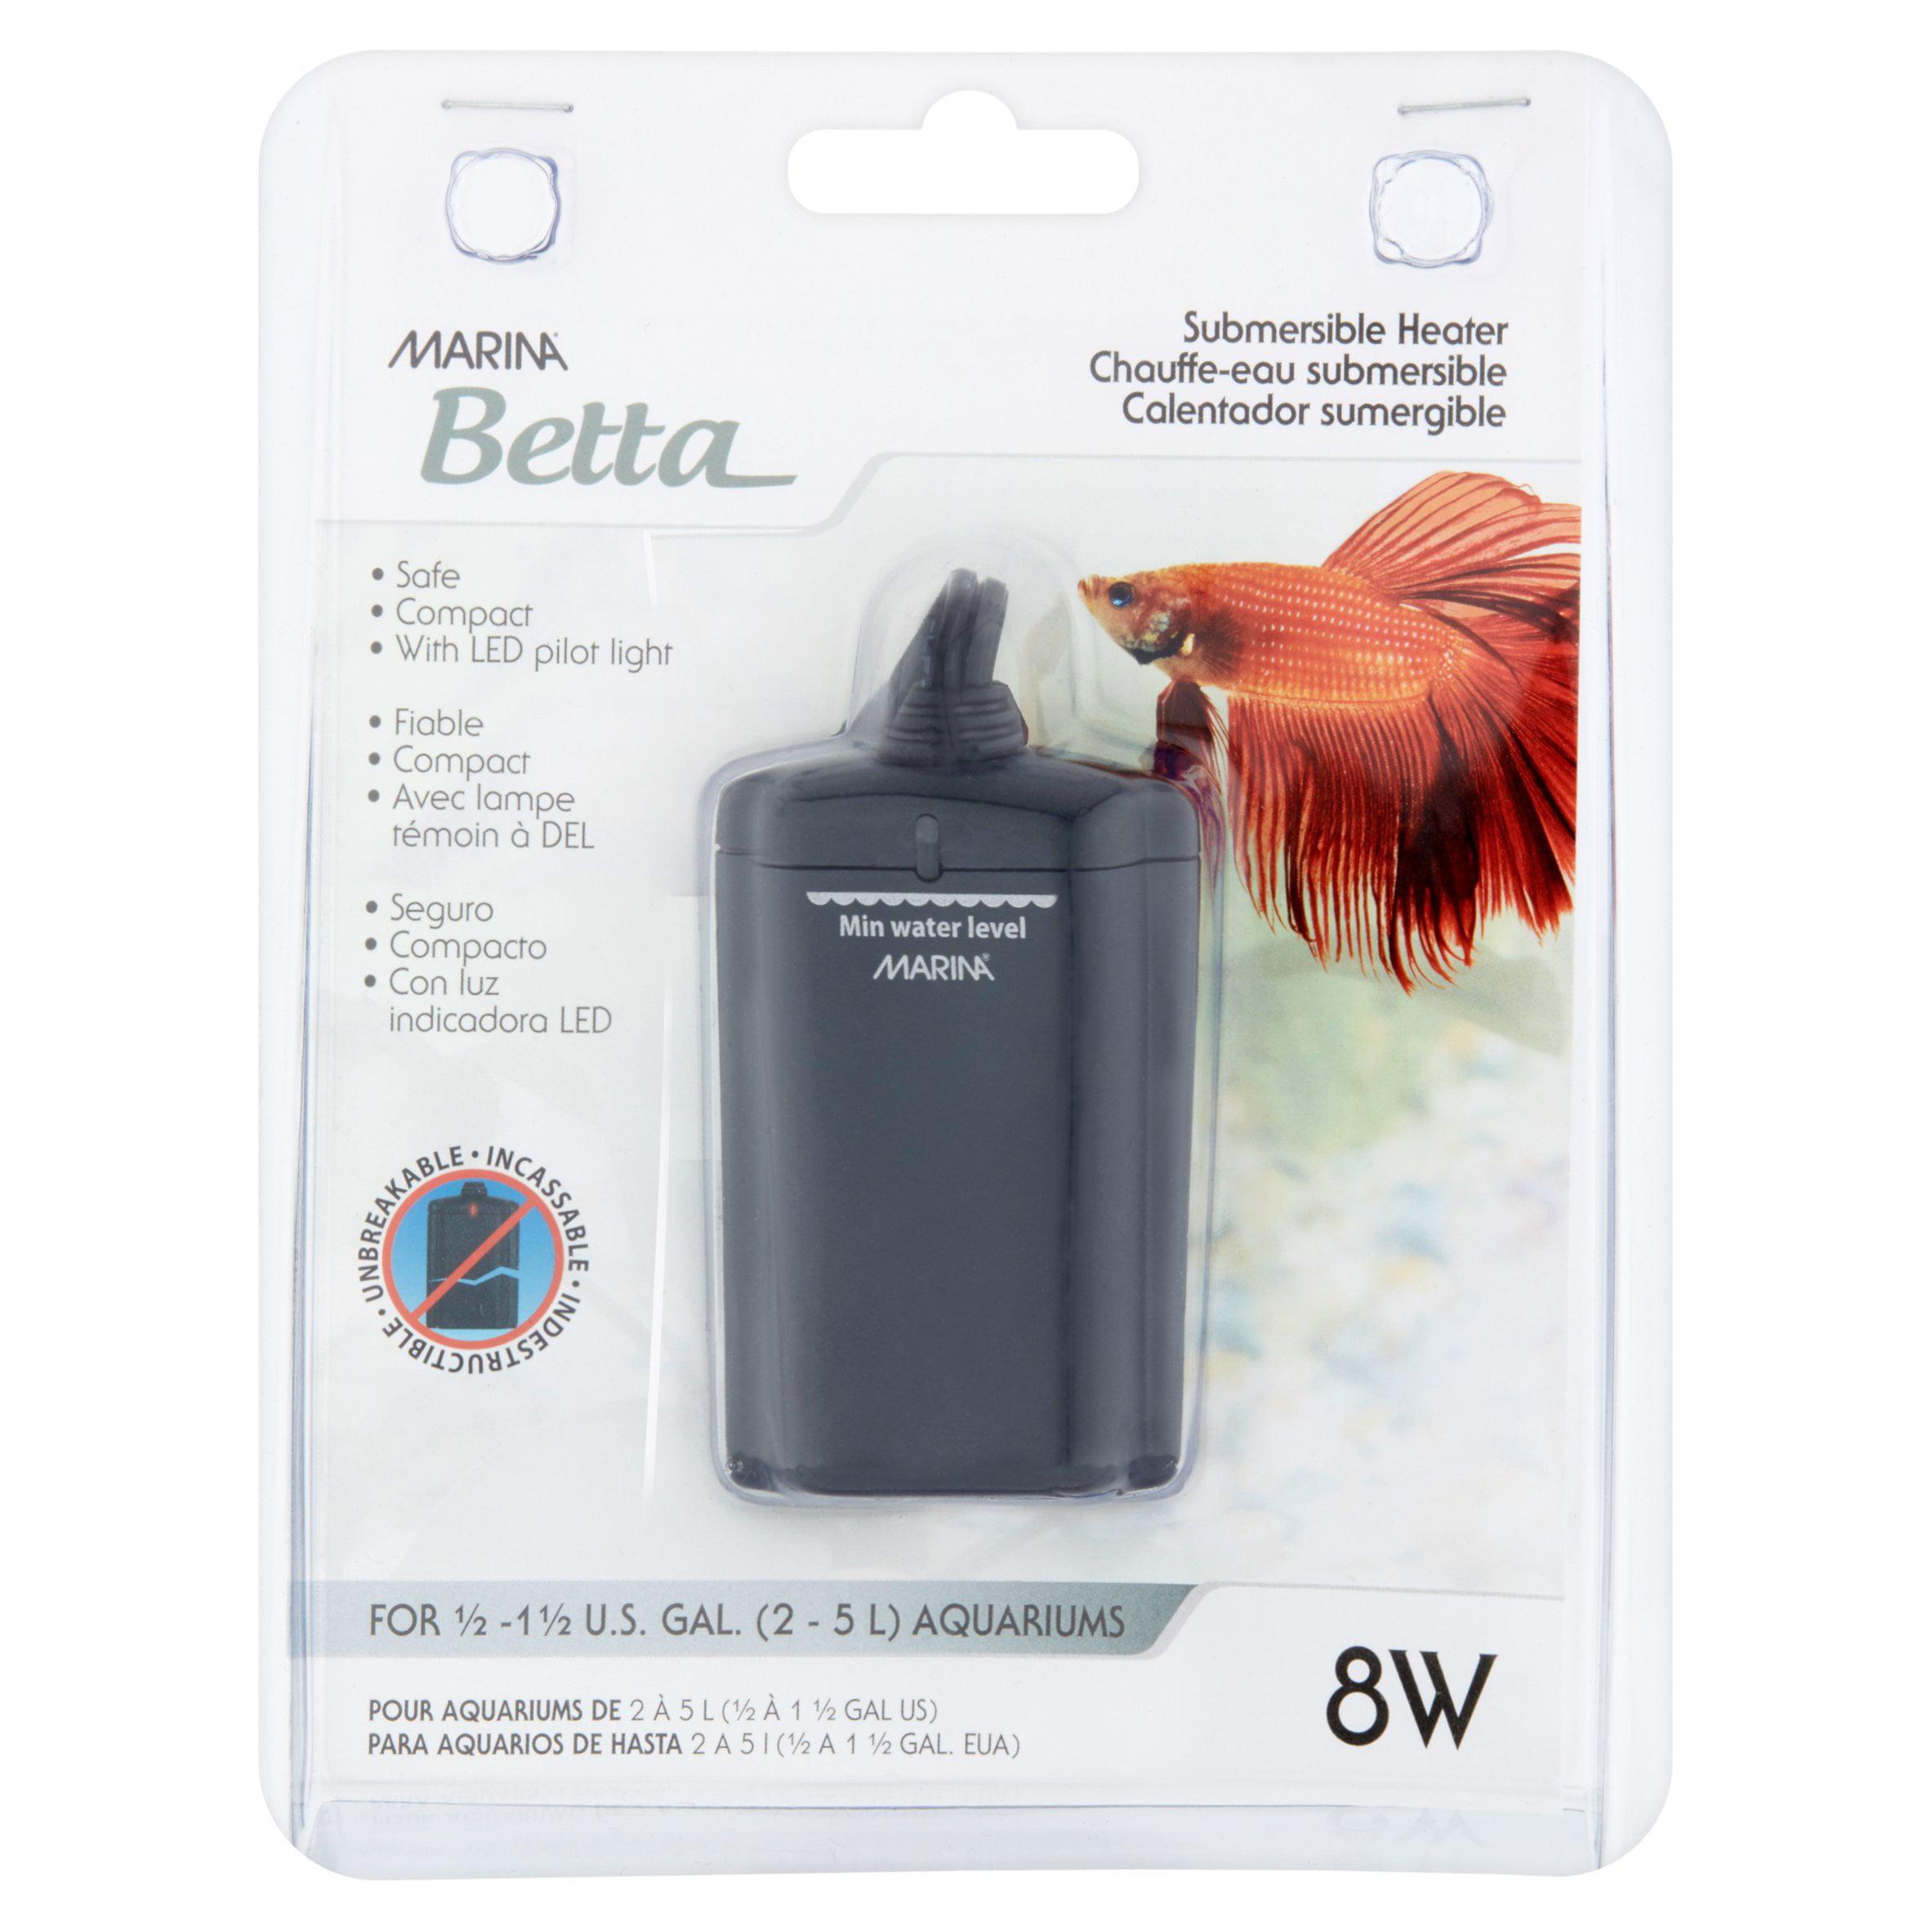 Marina Betta Submersible Heater - Walmart.com - Walmart.com